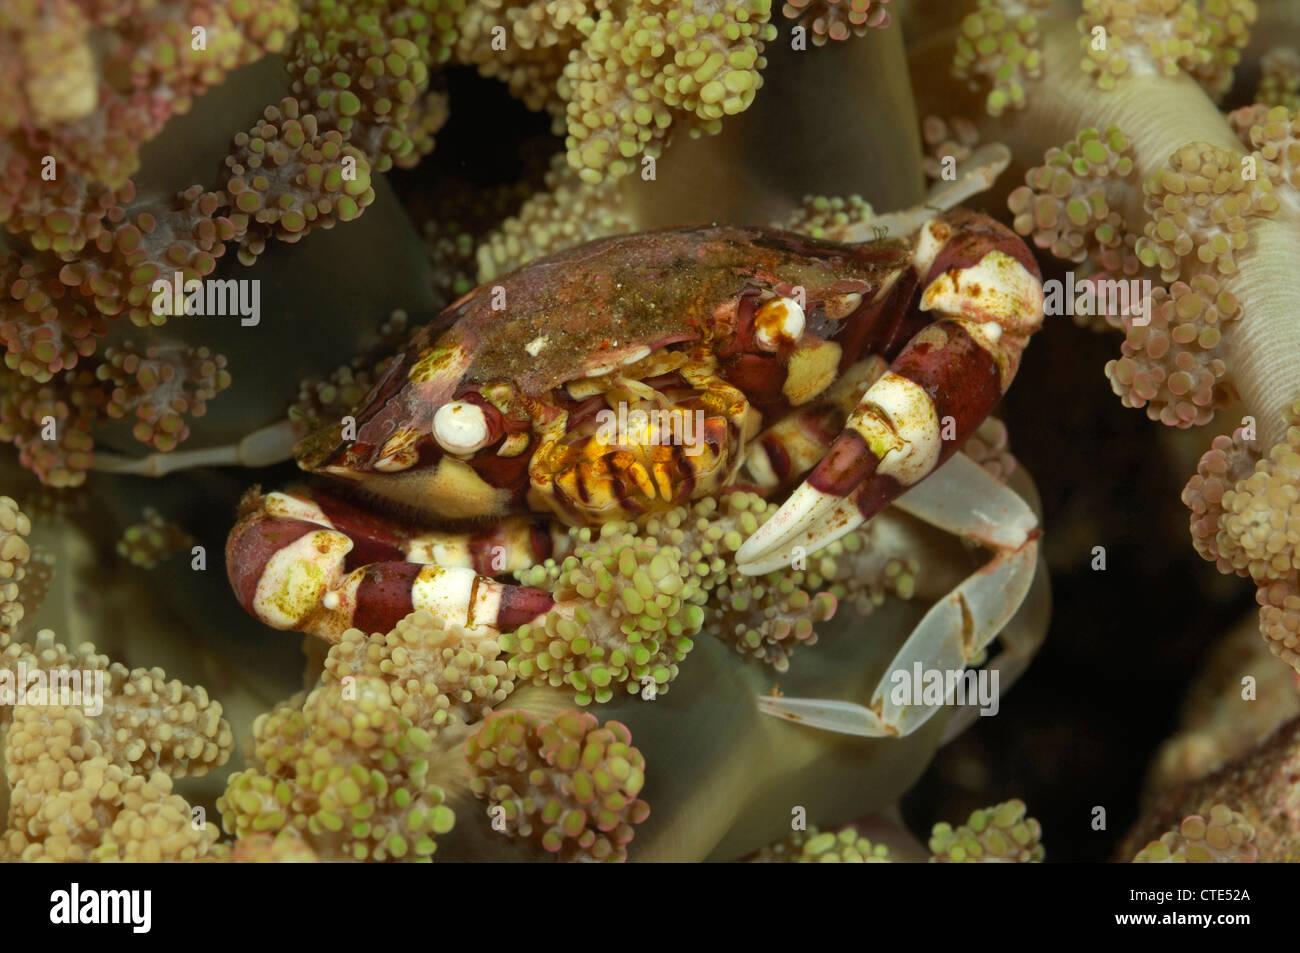 Coral crab, Lissocarcinus leavis, Alor, Indonesia - Stock Image